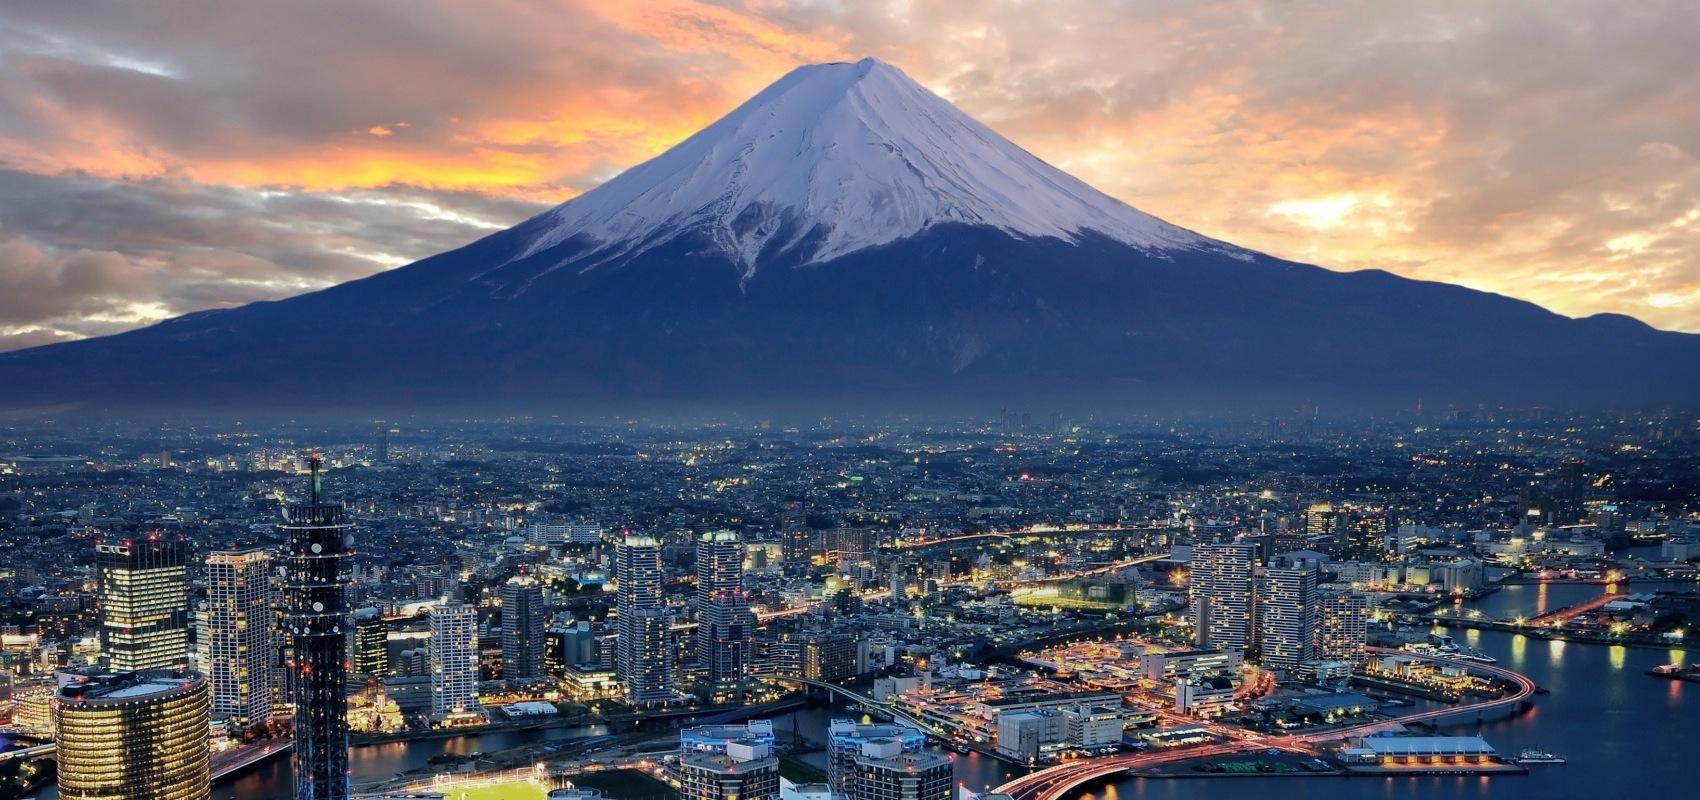 Mount Fuji and Tokyo